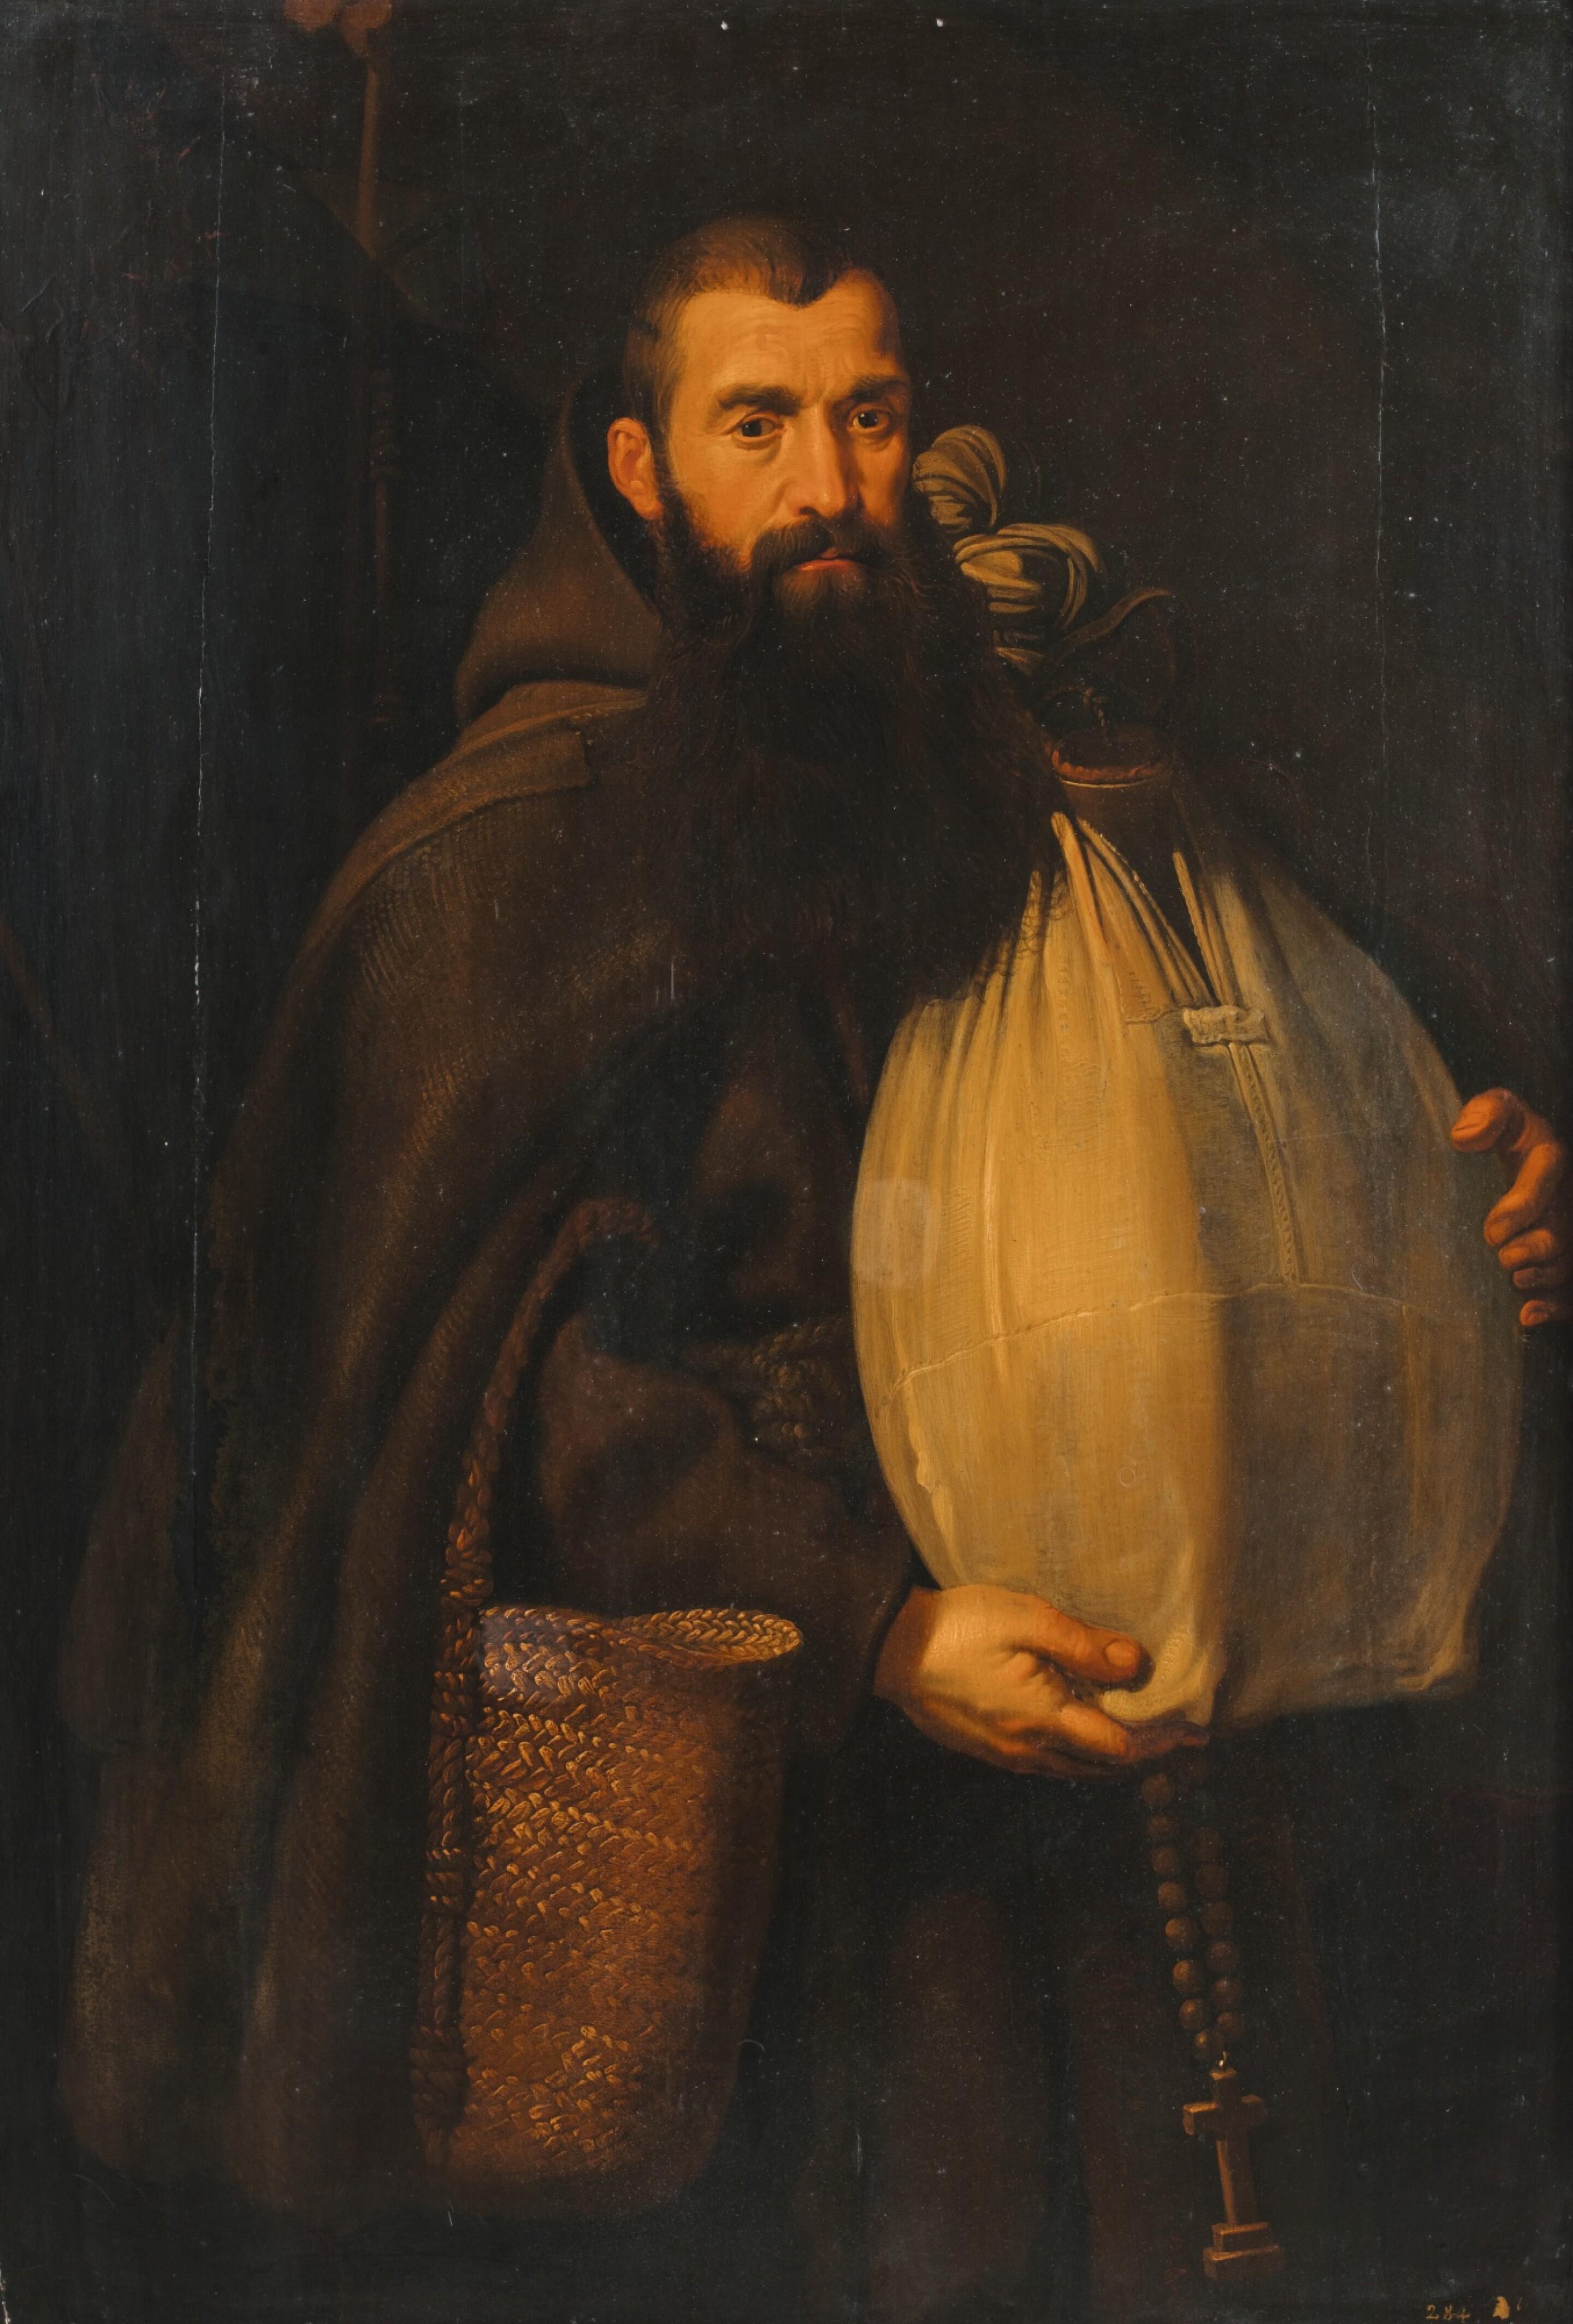 Félix de Cantalicio - Wikipedia, la enciclopedia libre